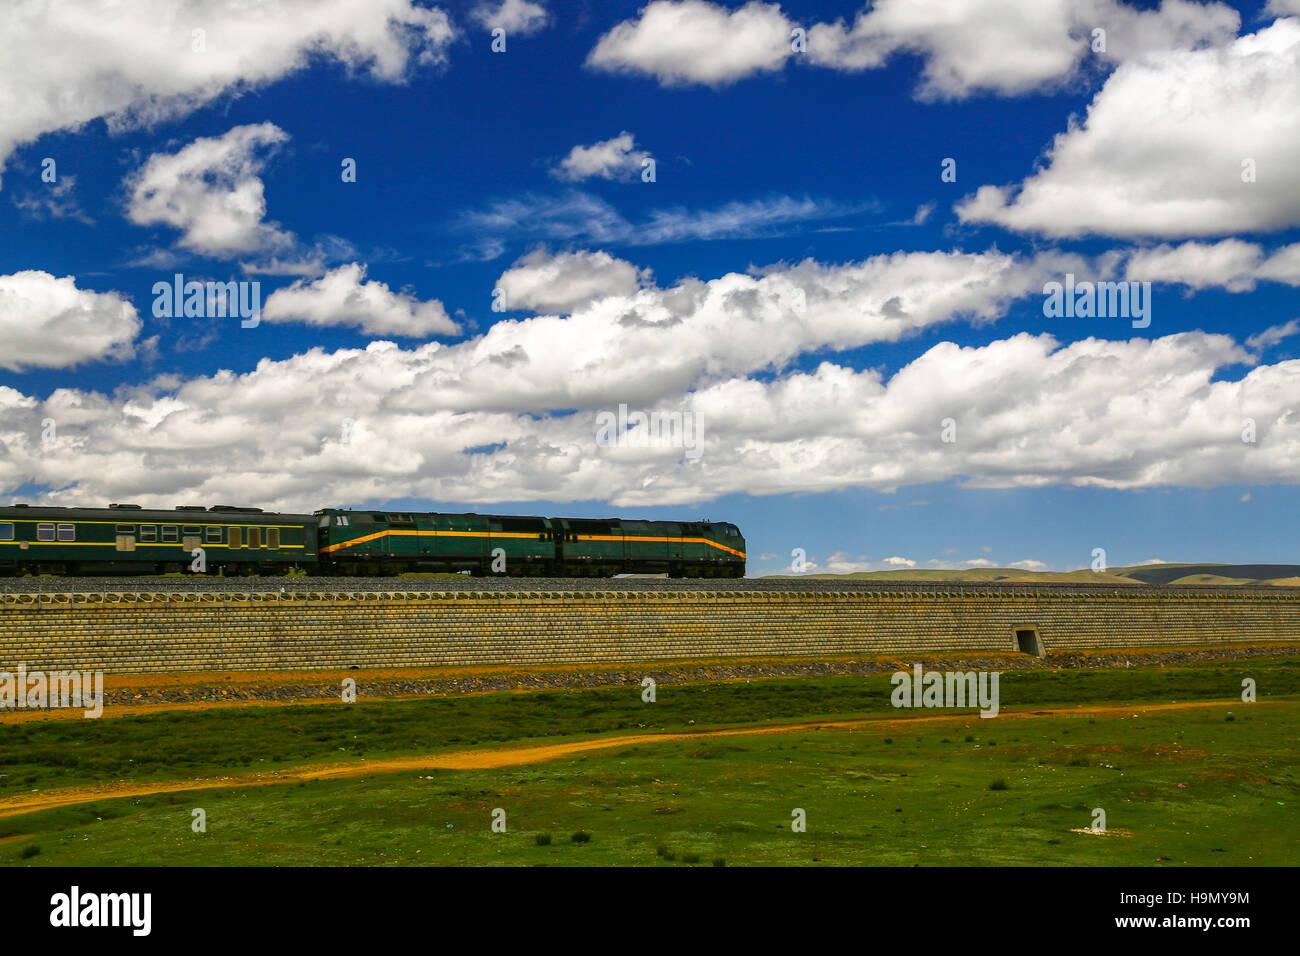 Northern Tibet Grassland - Stock Image